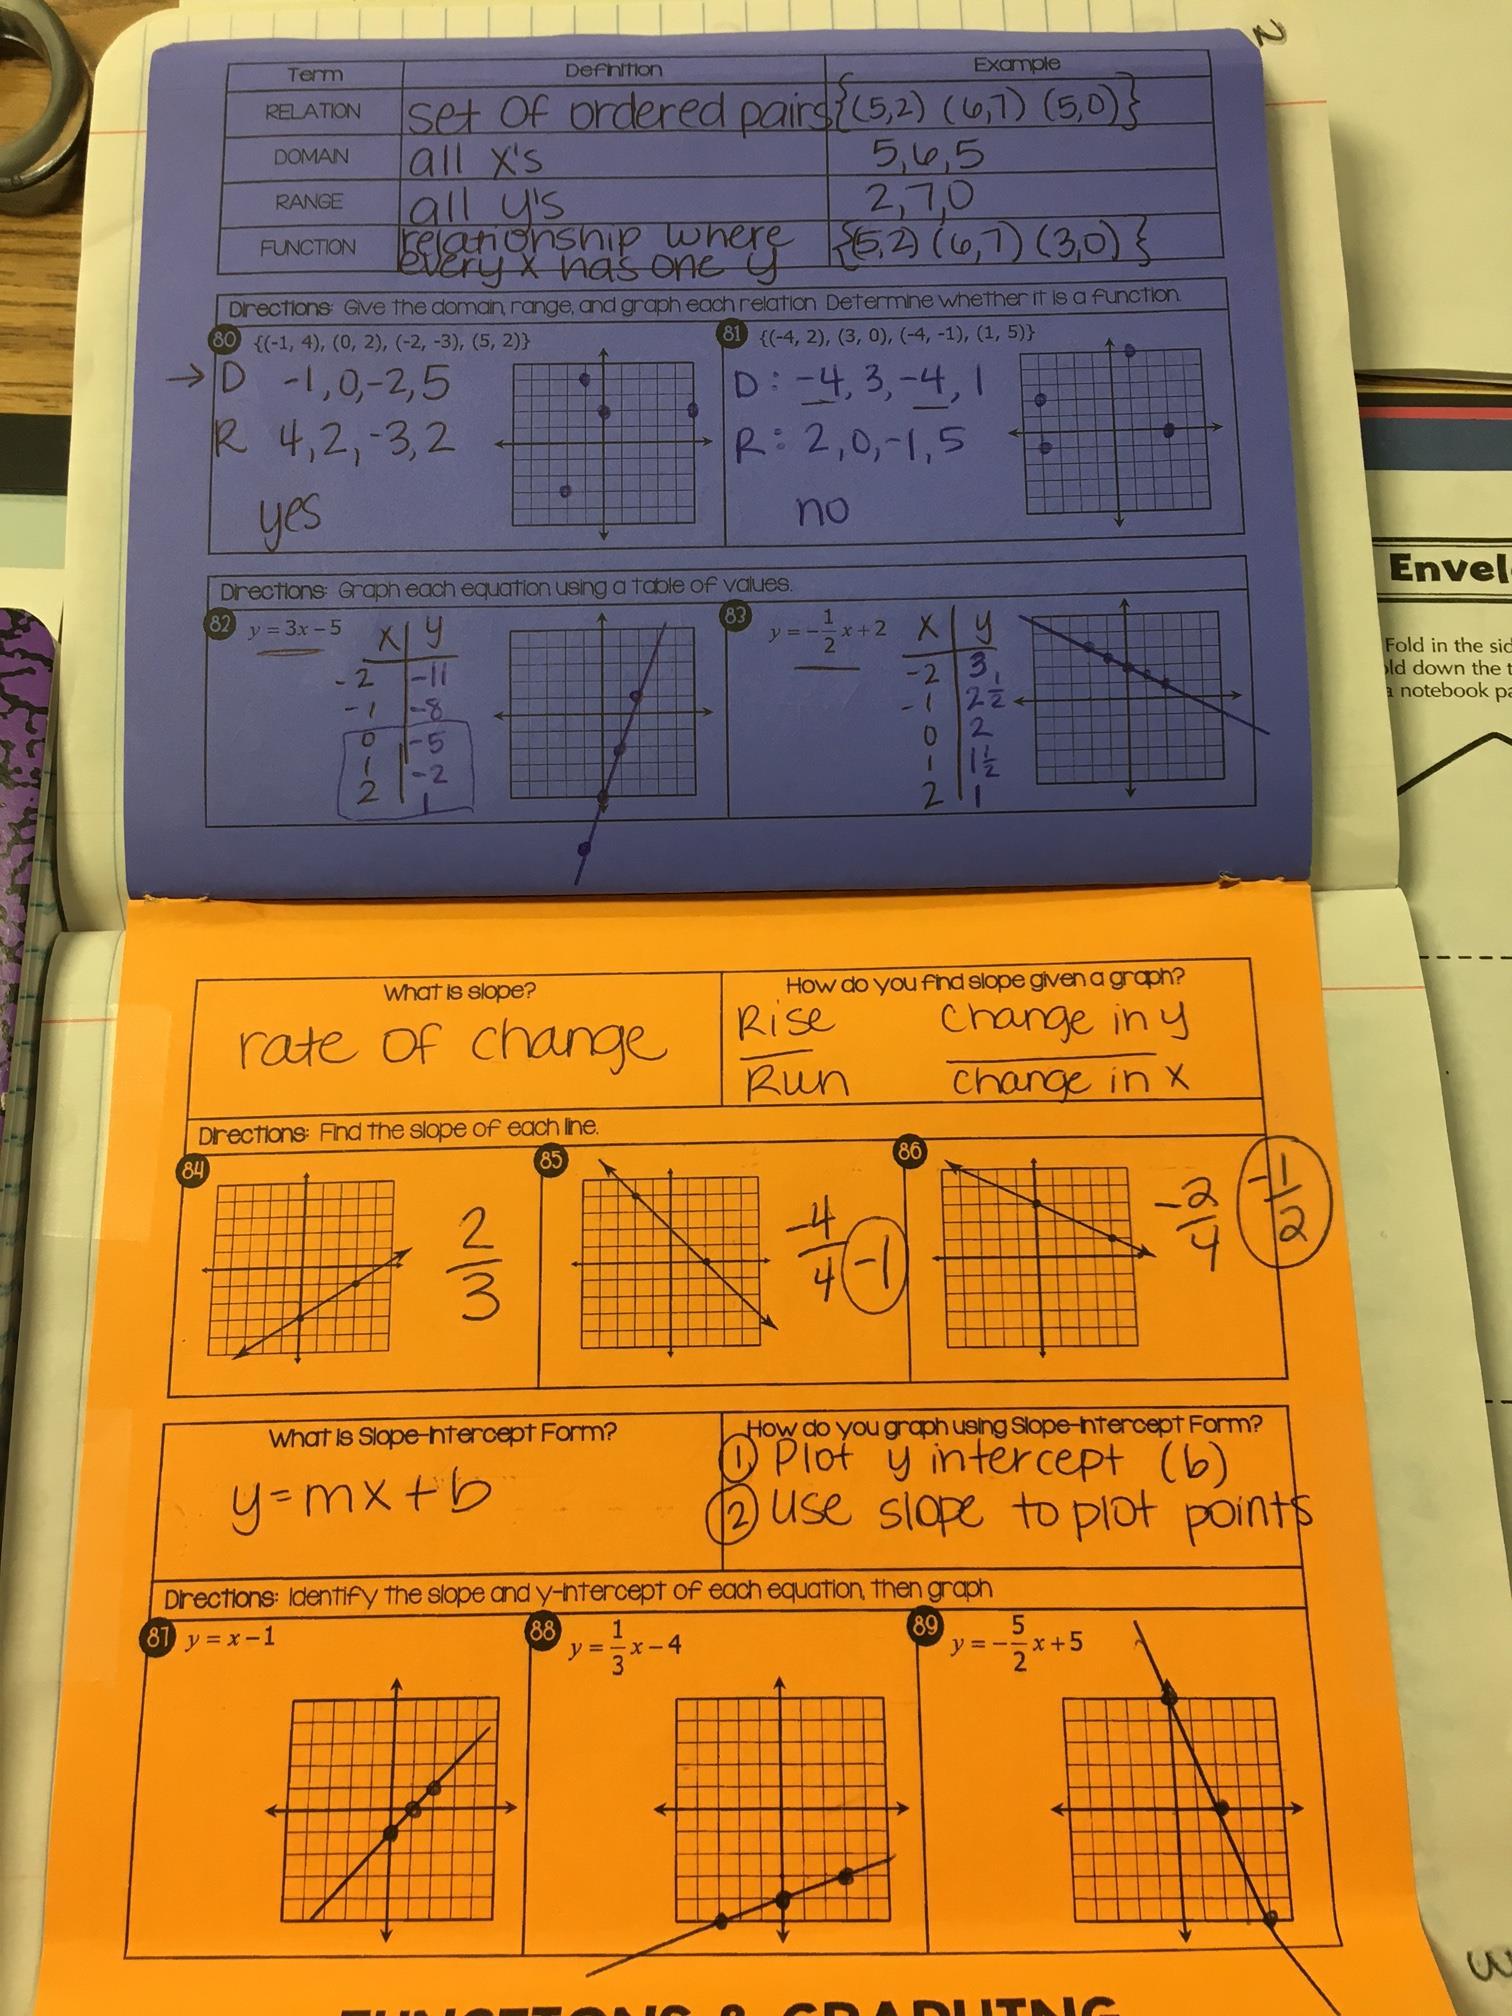 Thornton brittany algebra notebook page 7 fandeluxe Gallery